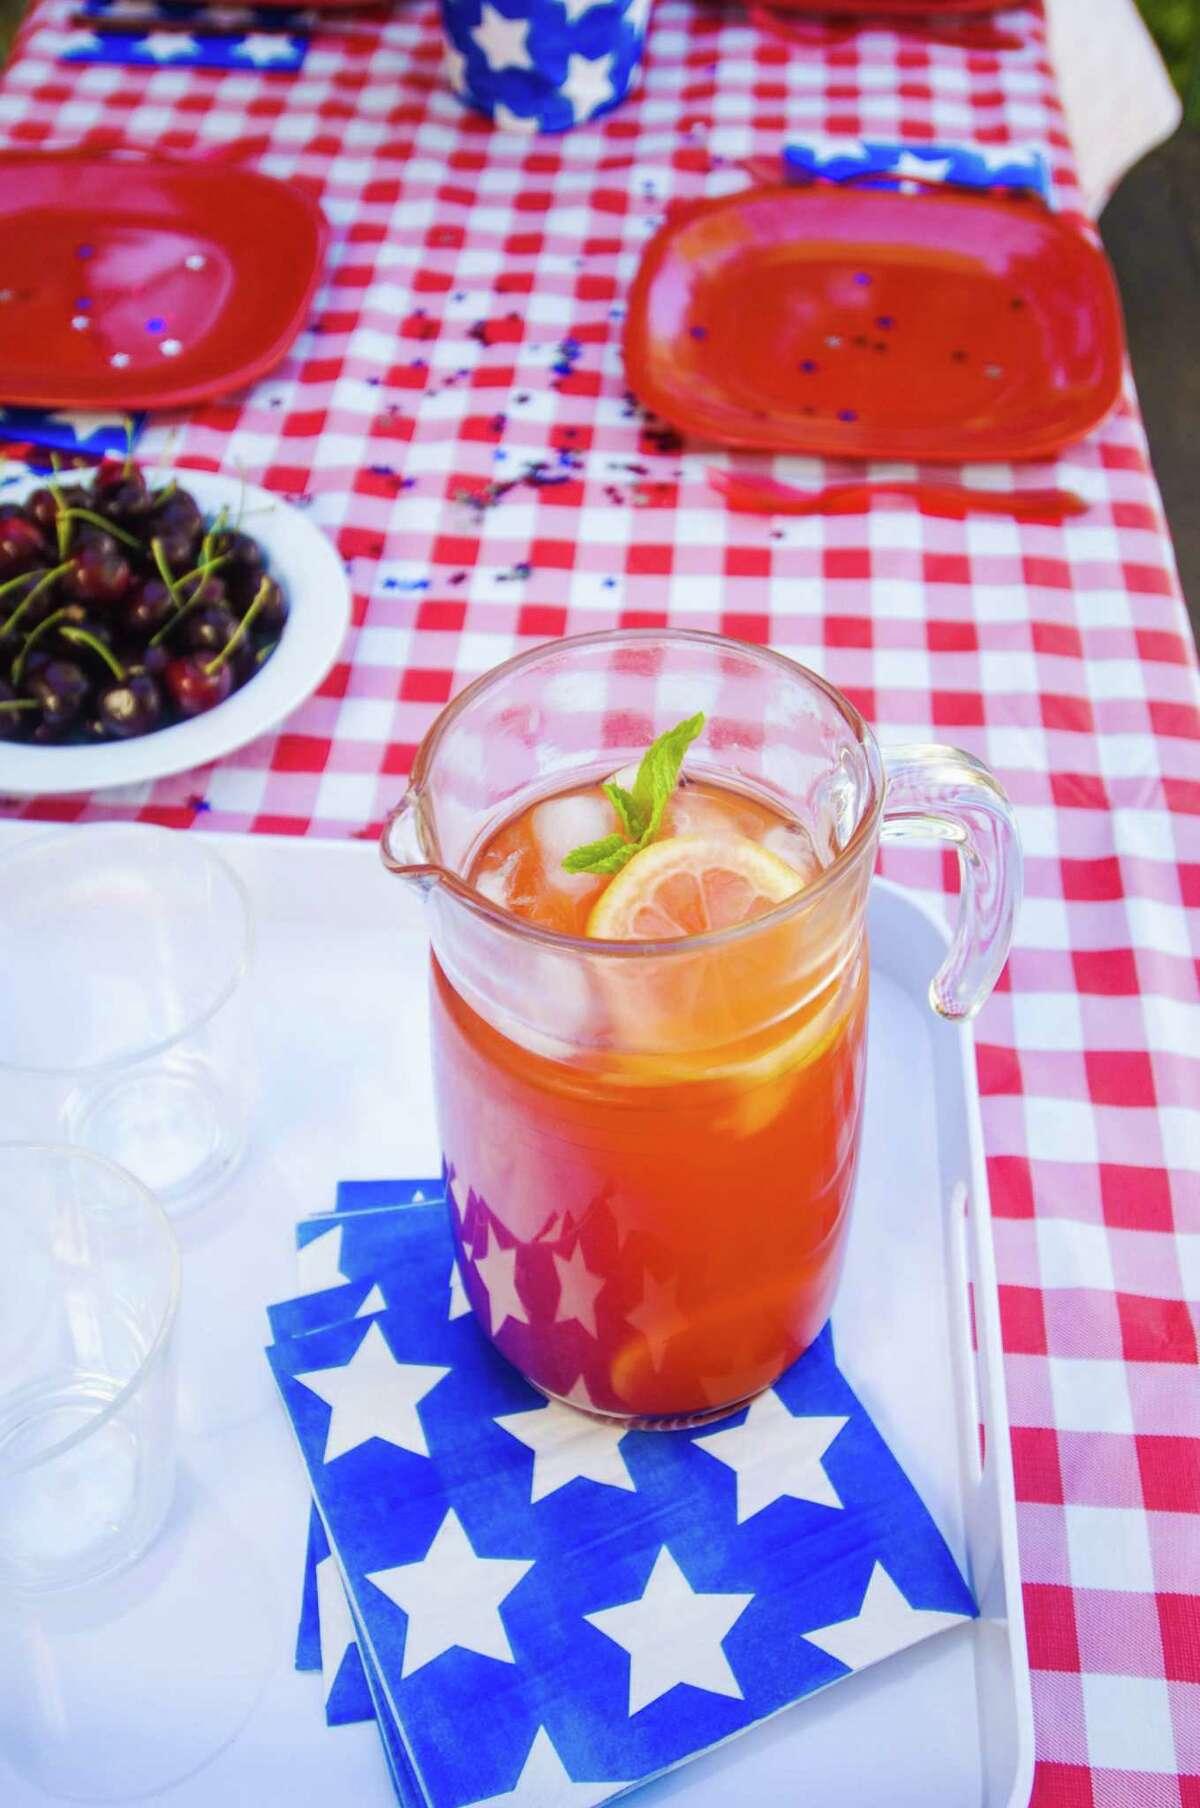 Blueberry lemonade is a refreshing summer drink.